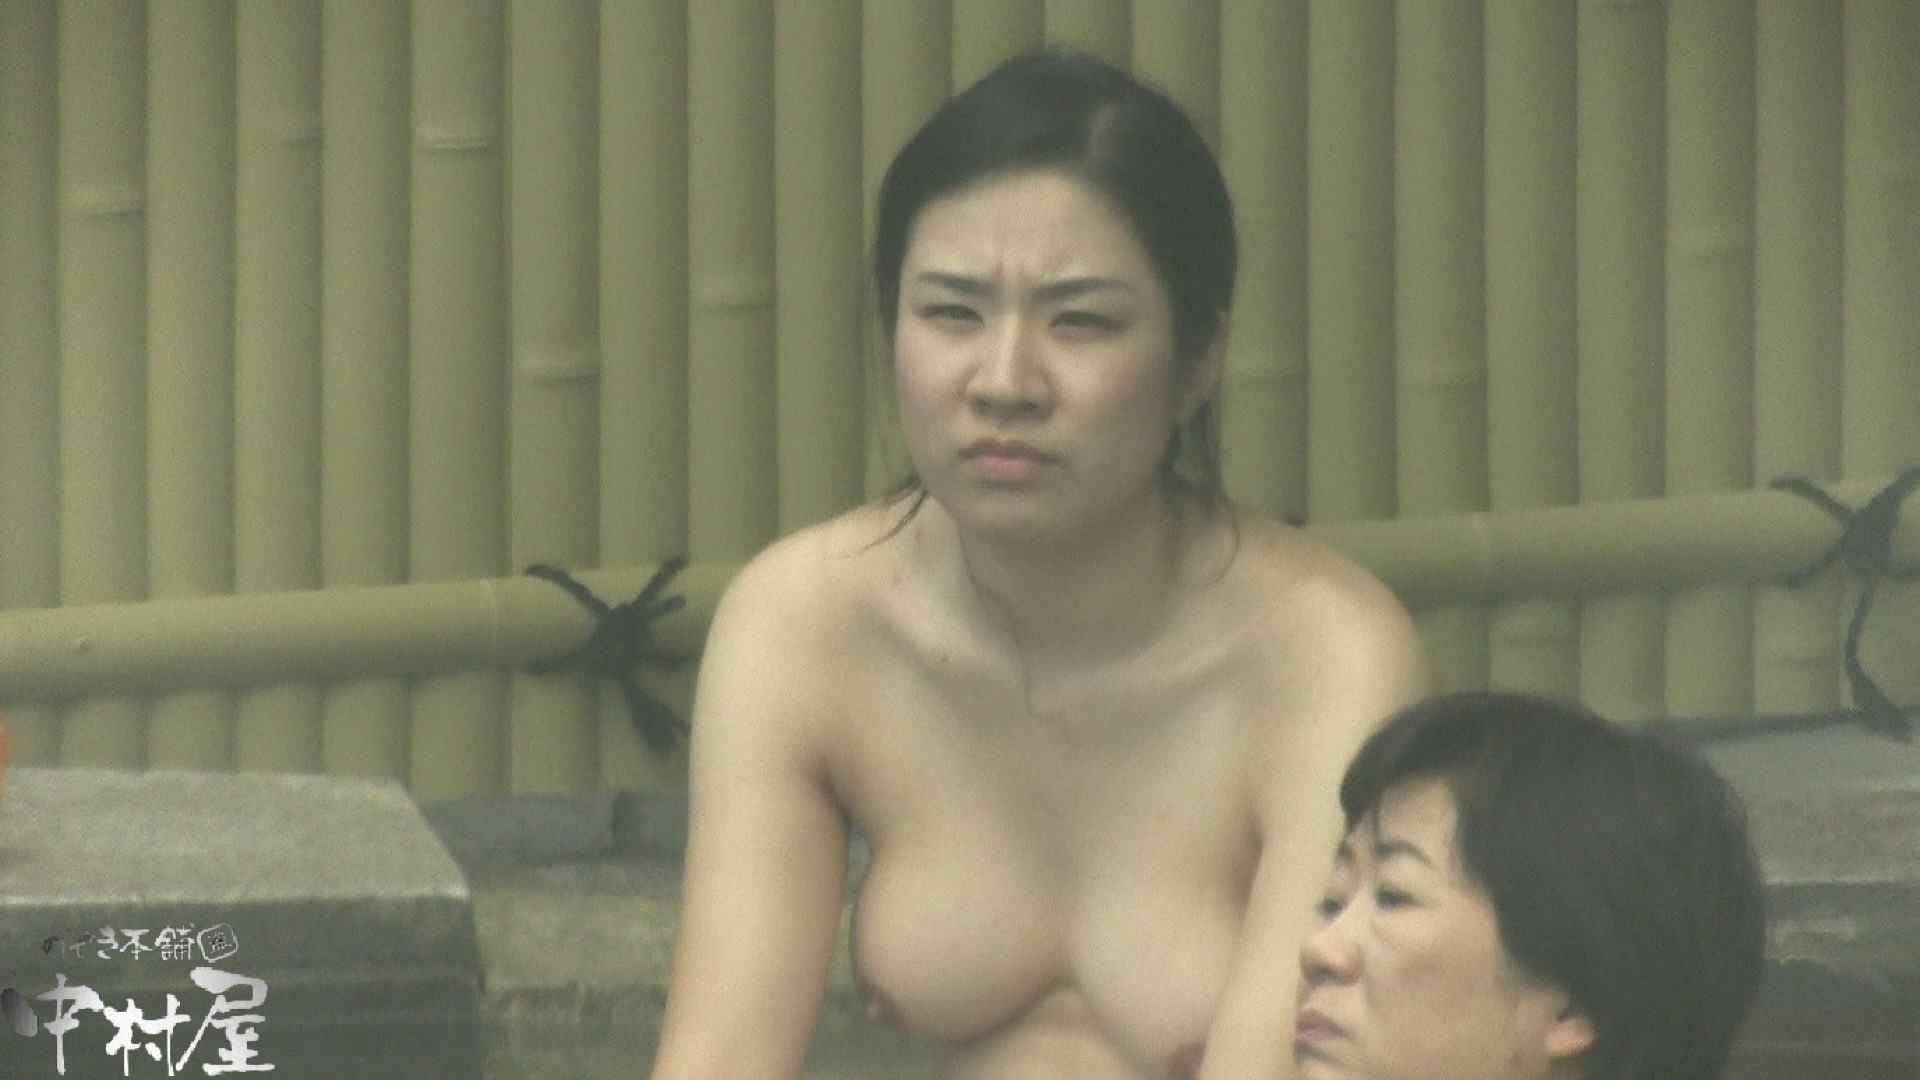 Aquaな露天風呂Vol.913 盗撮大放出 ヌード画像 65連発 48